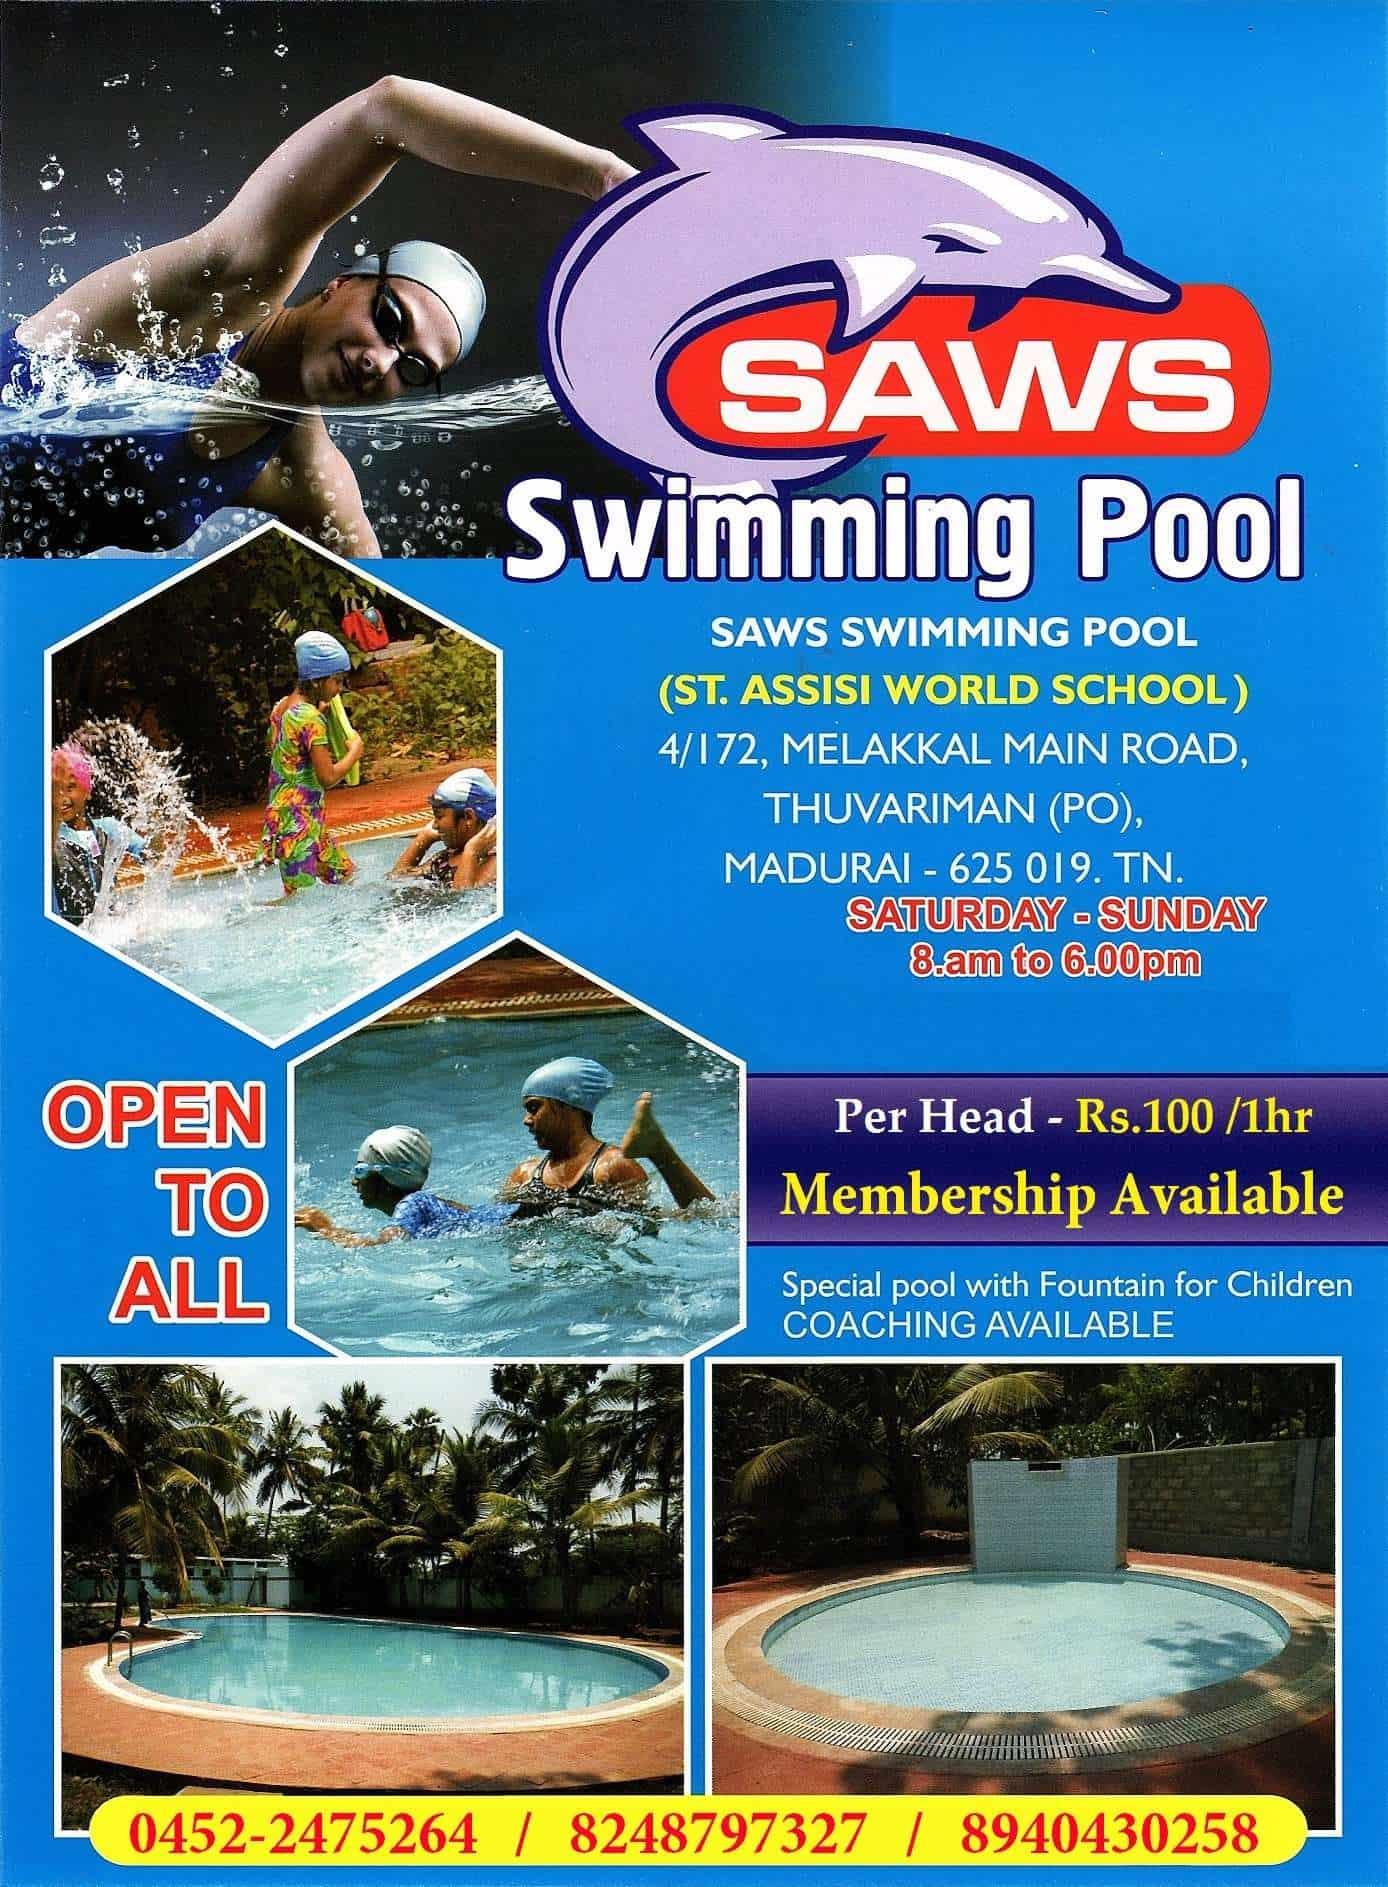 Saws Swimming Pool Thuvariman Swimming Pools In Madurai Justdial